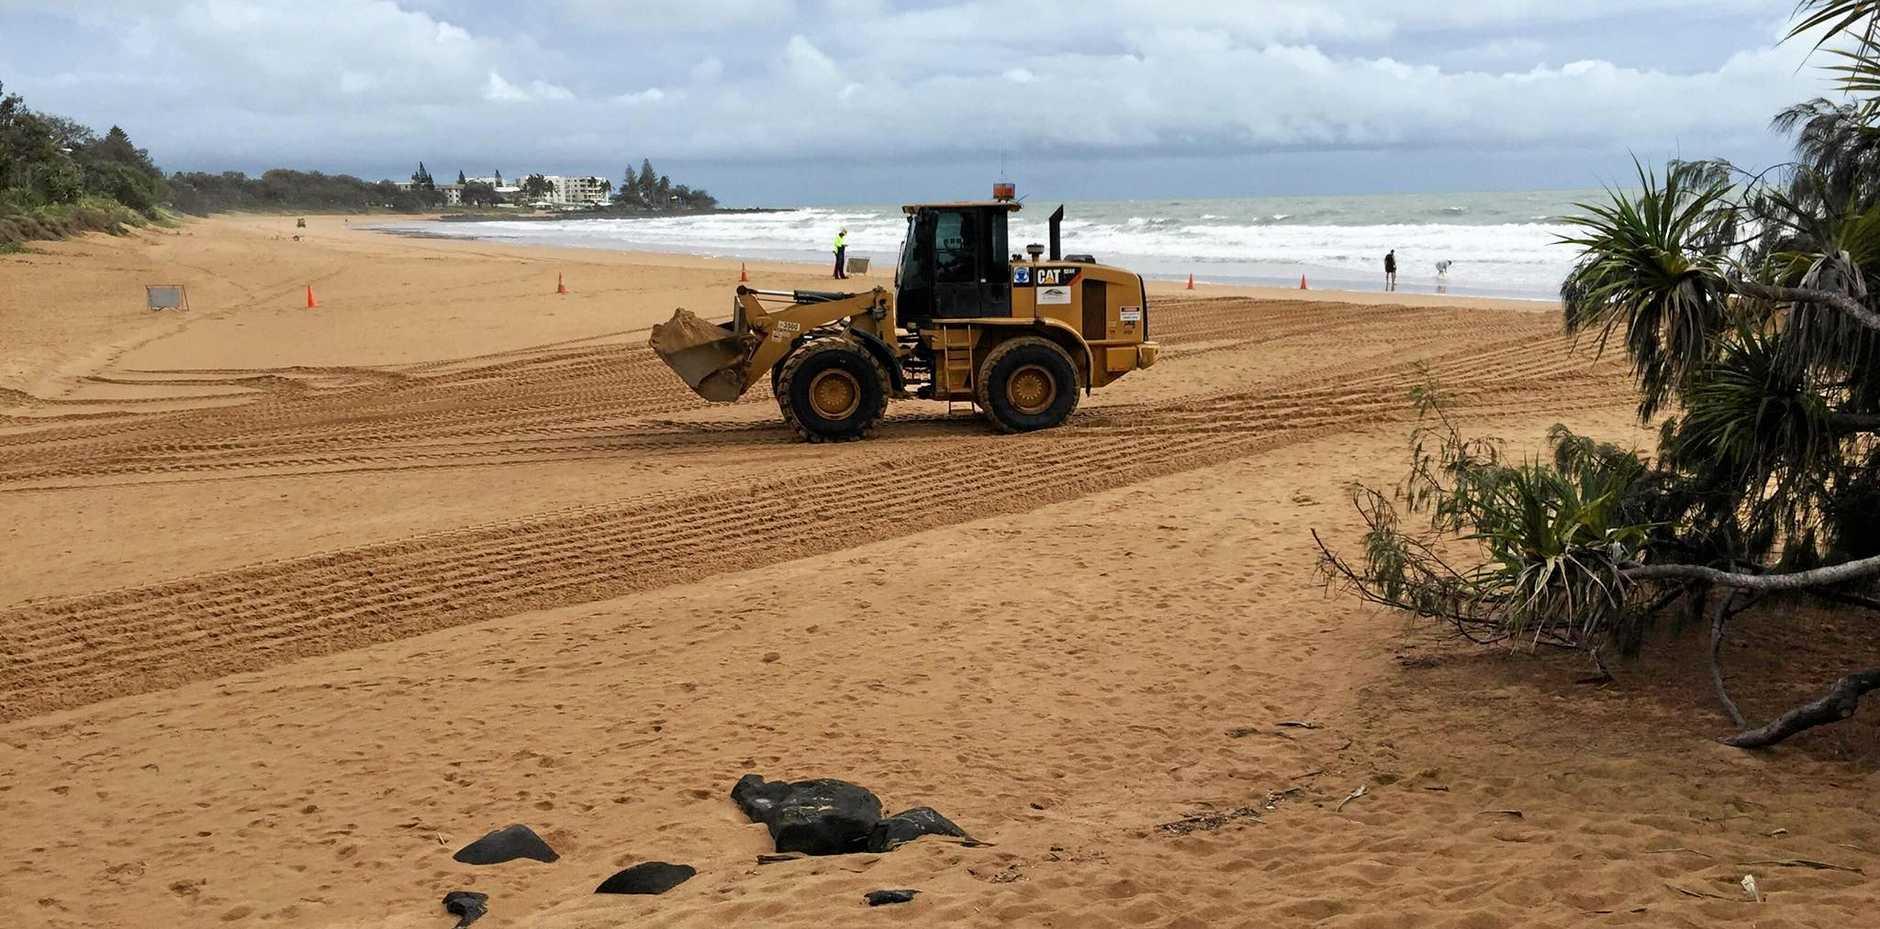 BEACH WORK: Channel clearing works underway on Kellys Beach.